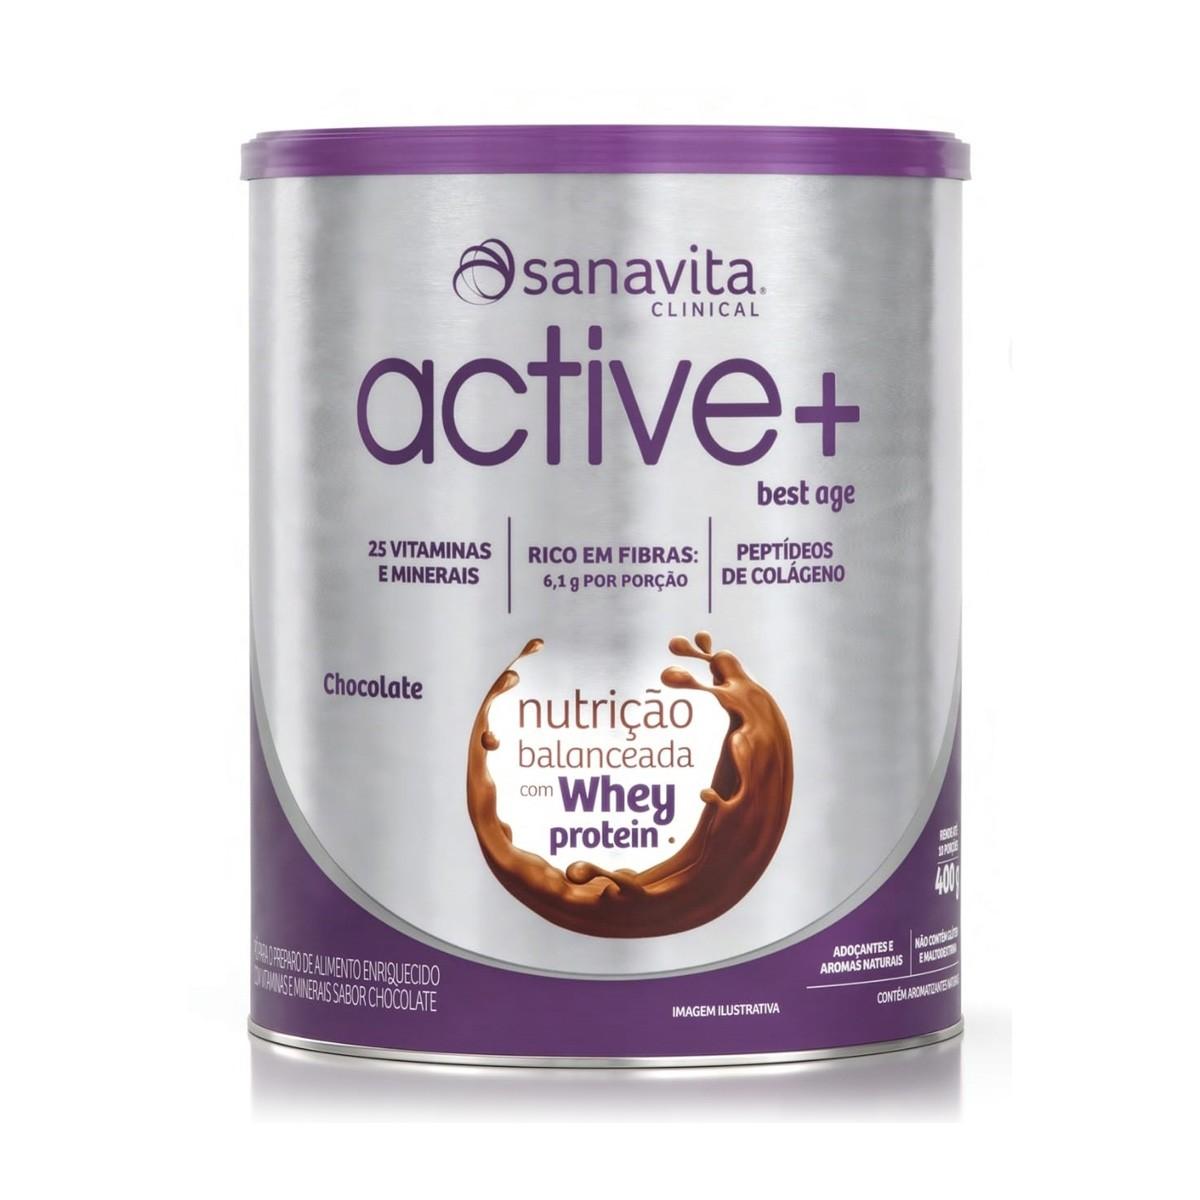 ACTIVE + BEST AGE CHOCOLATE 400G - SANAVITA